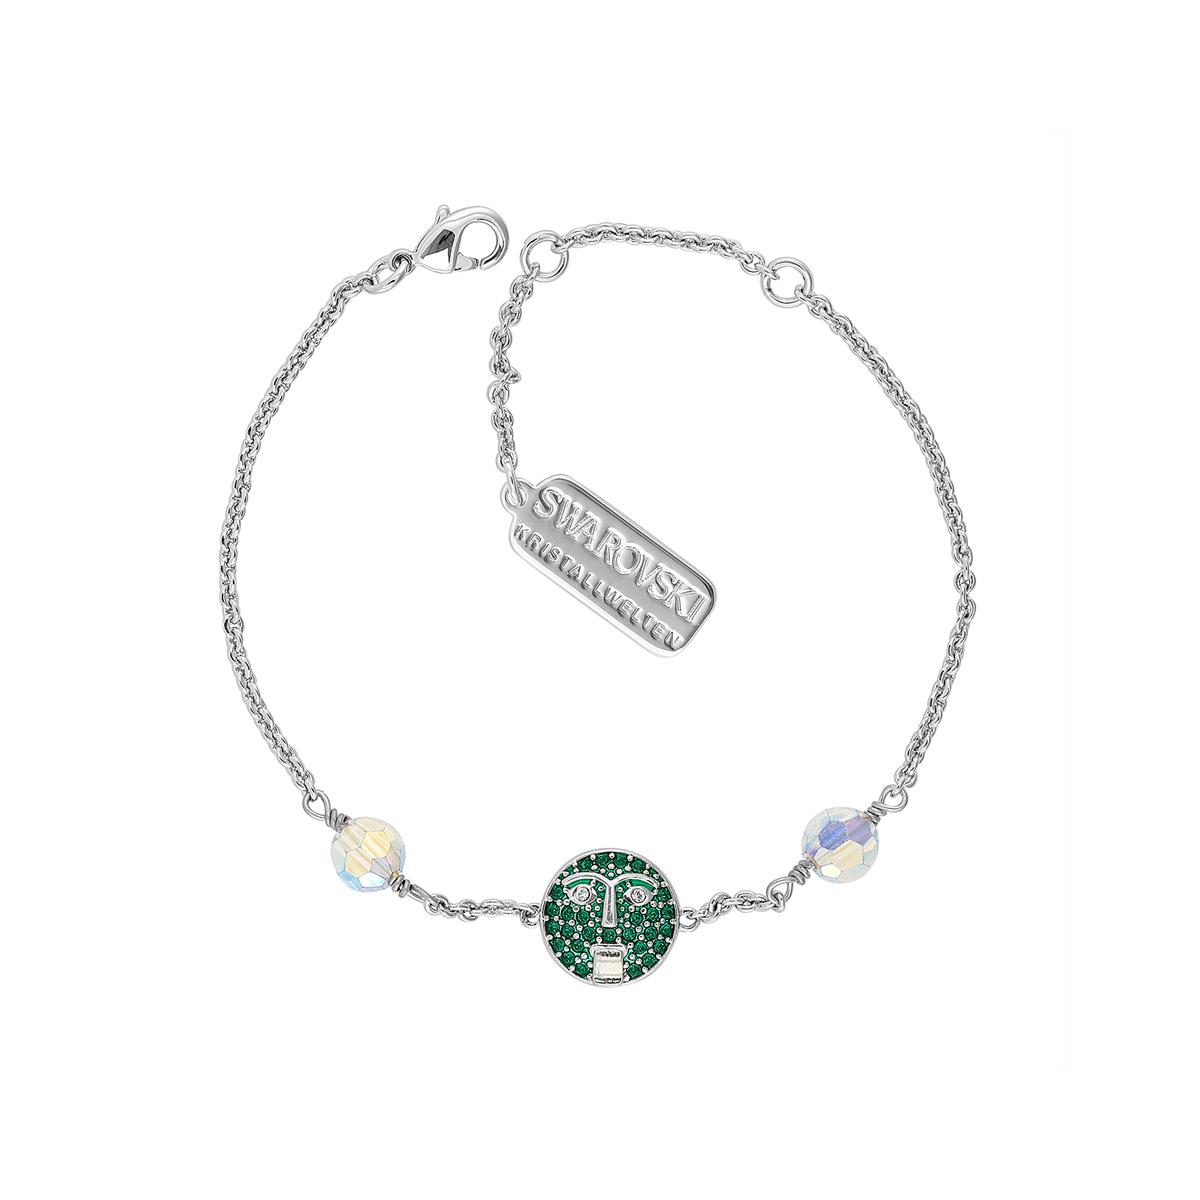 Swarovski Charm Bracelet: Swarovski Shopping Souvenir